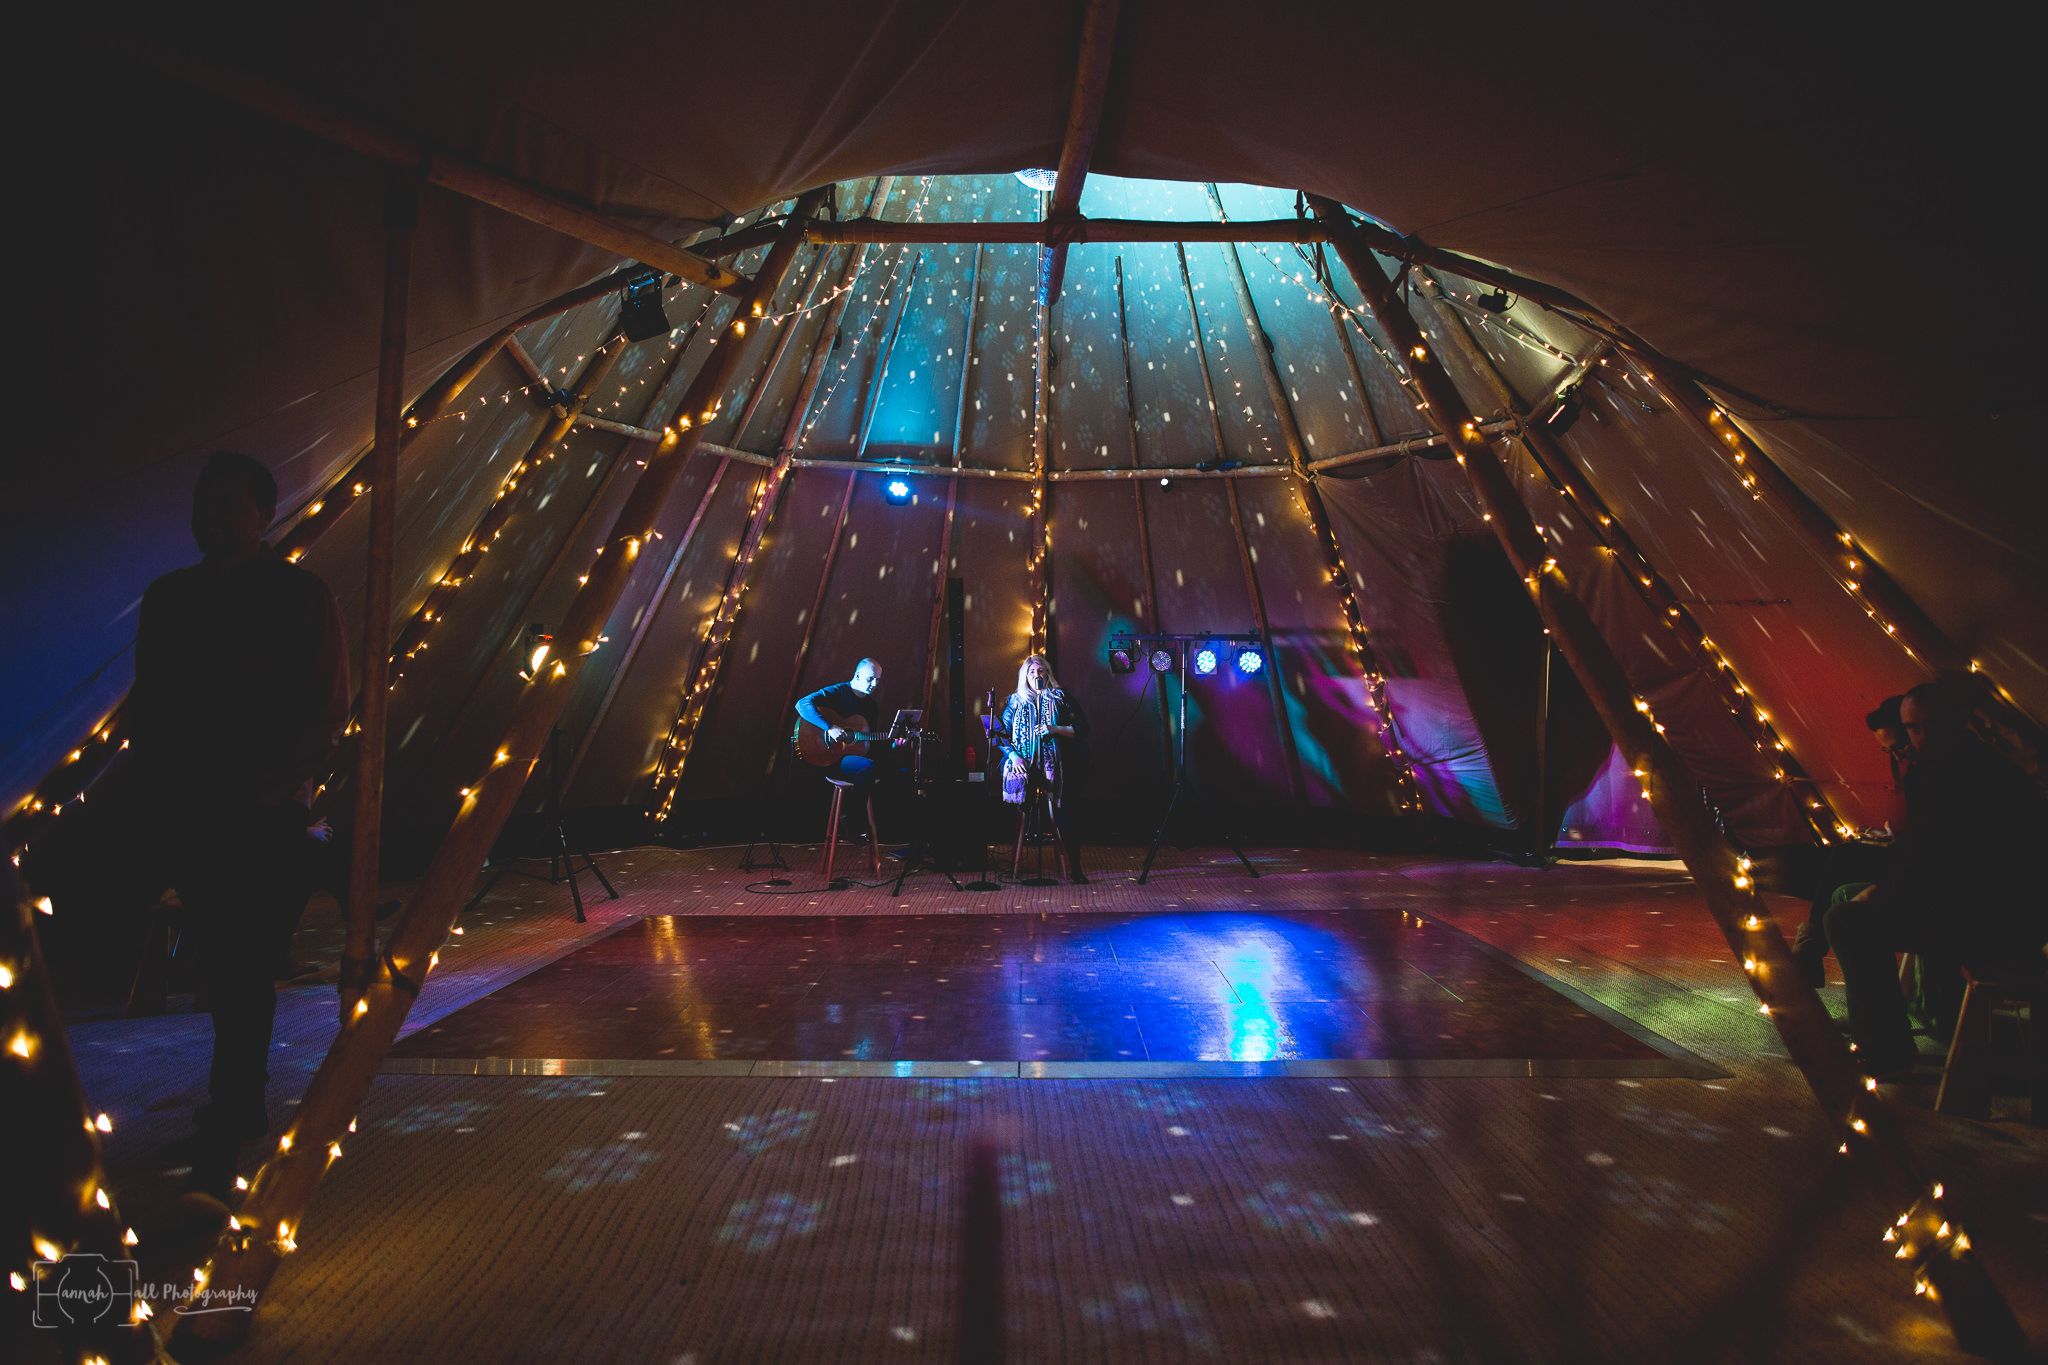 hhp_derbyshire_wedding_photographer-13